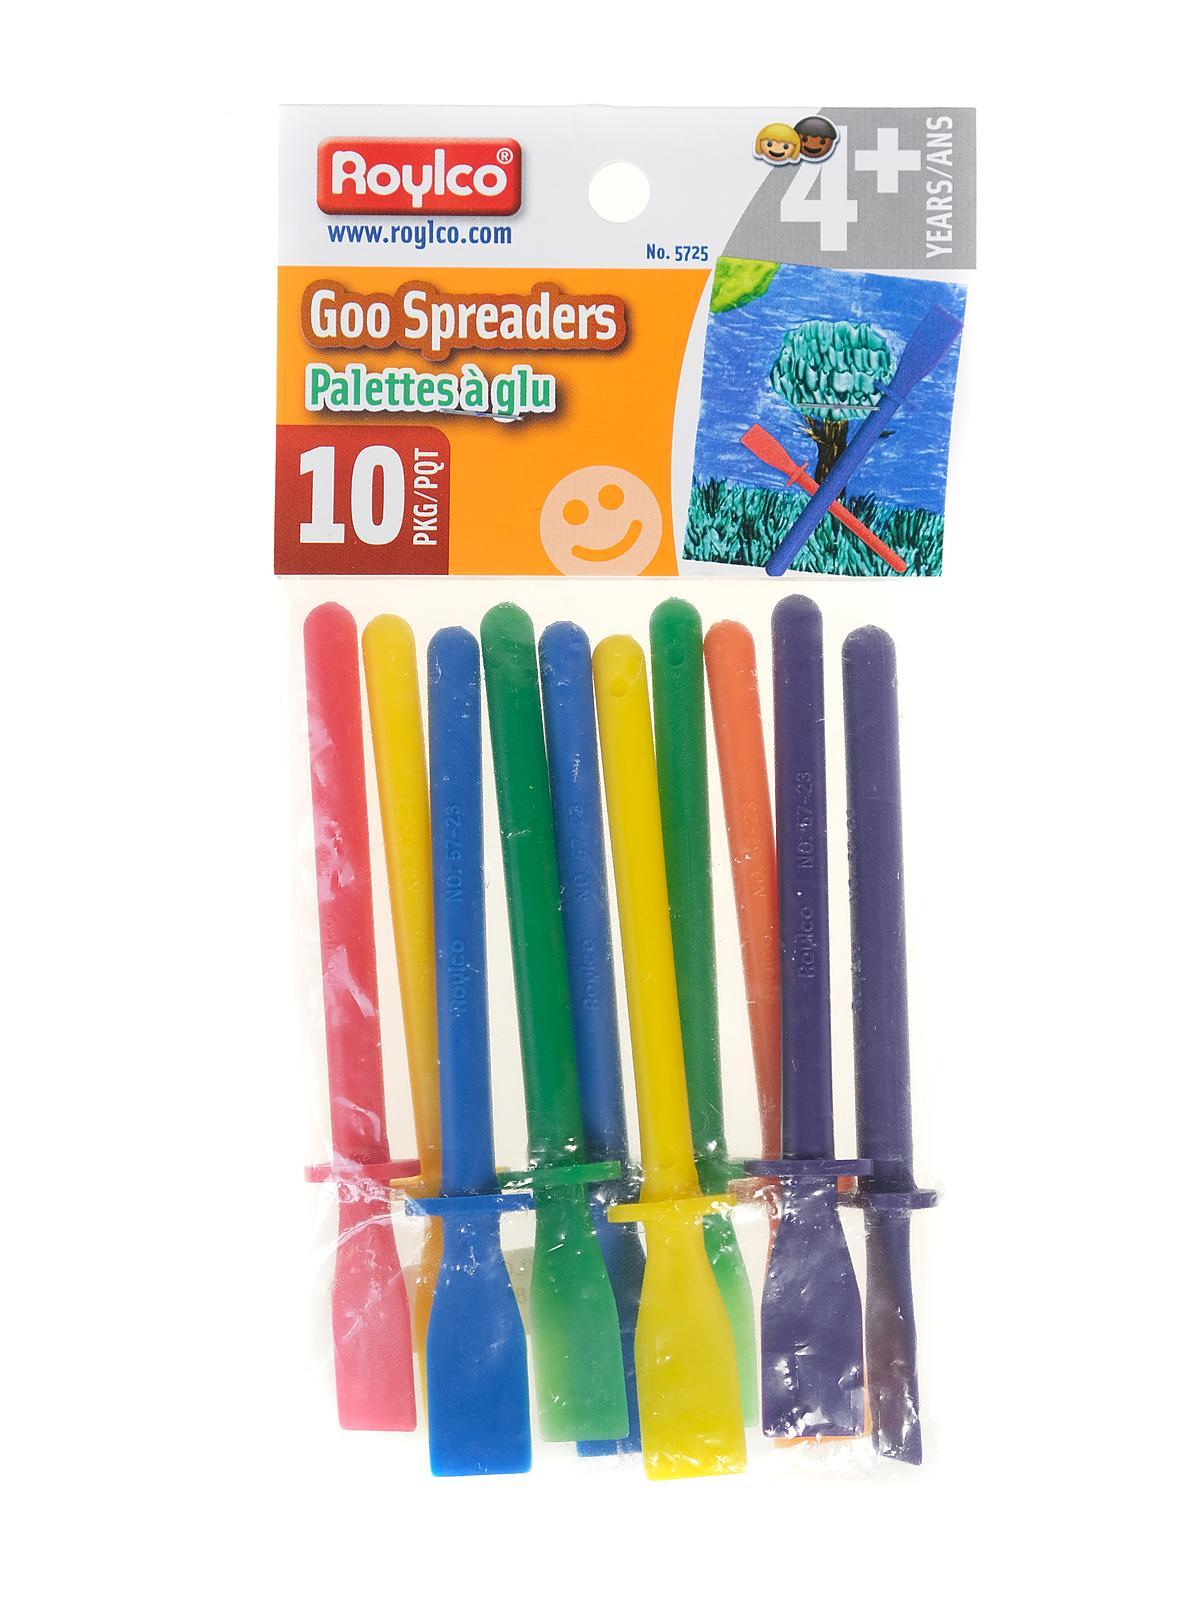 Goo Spreaders